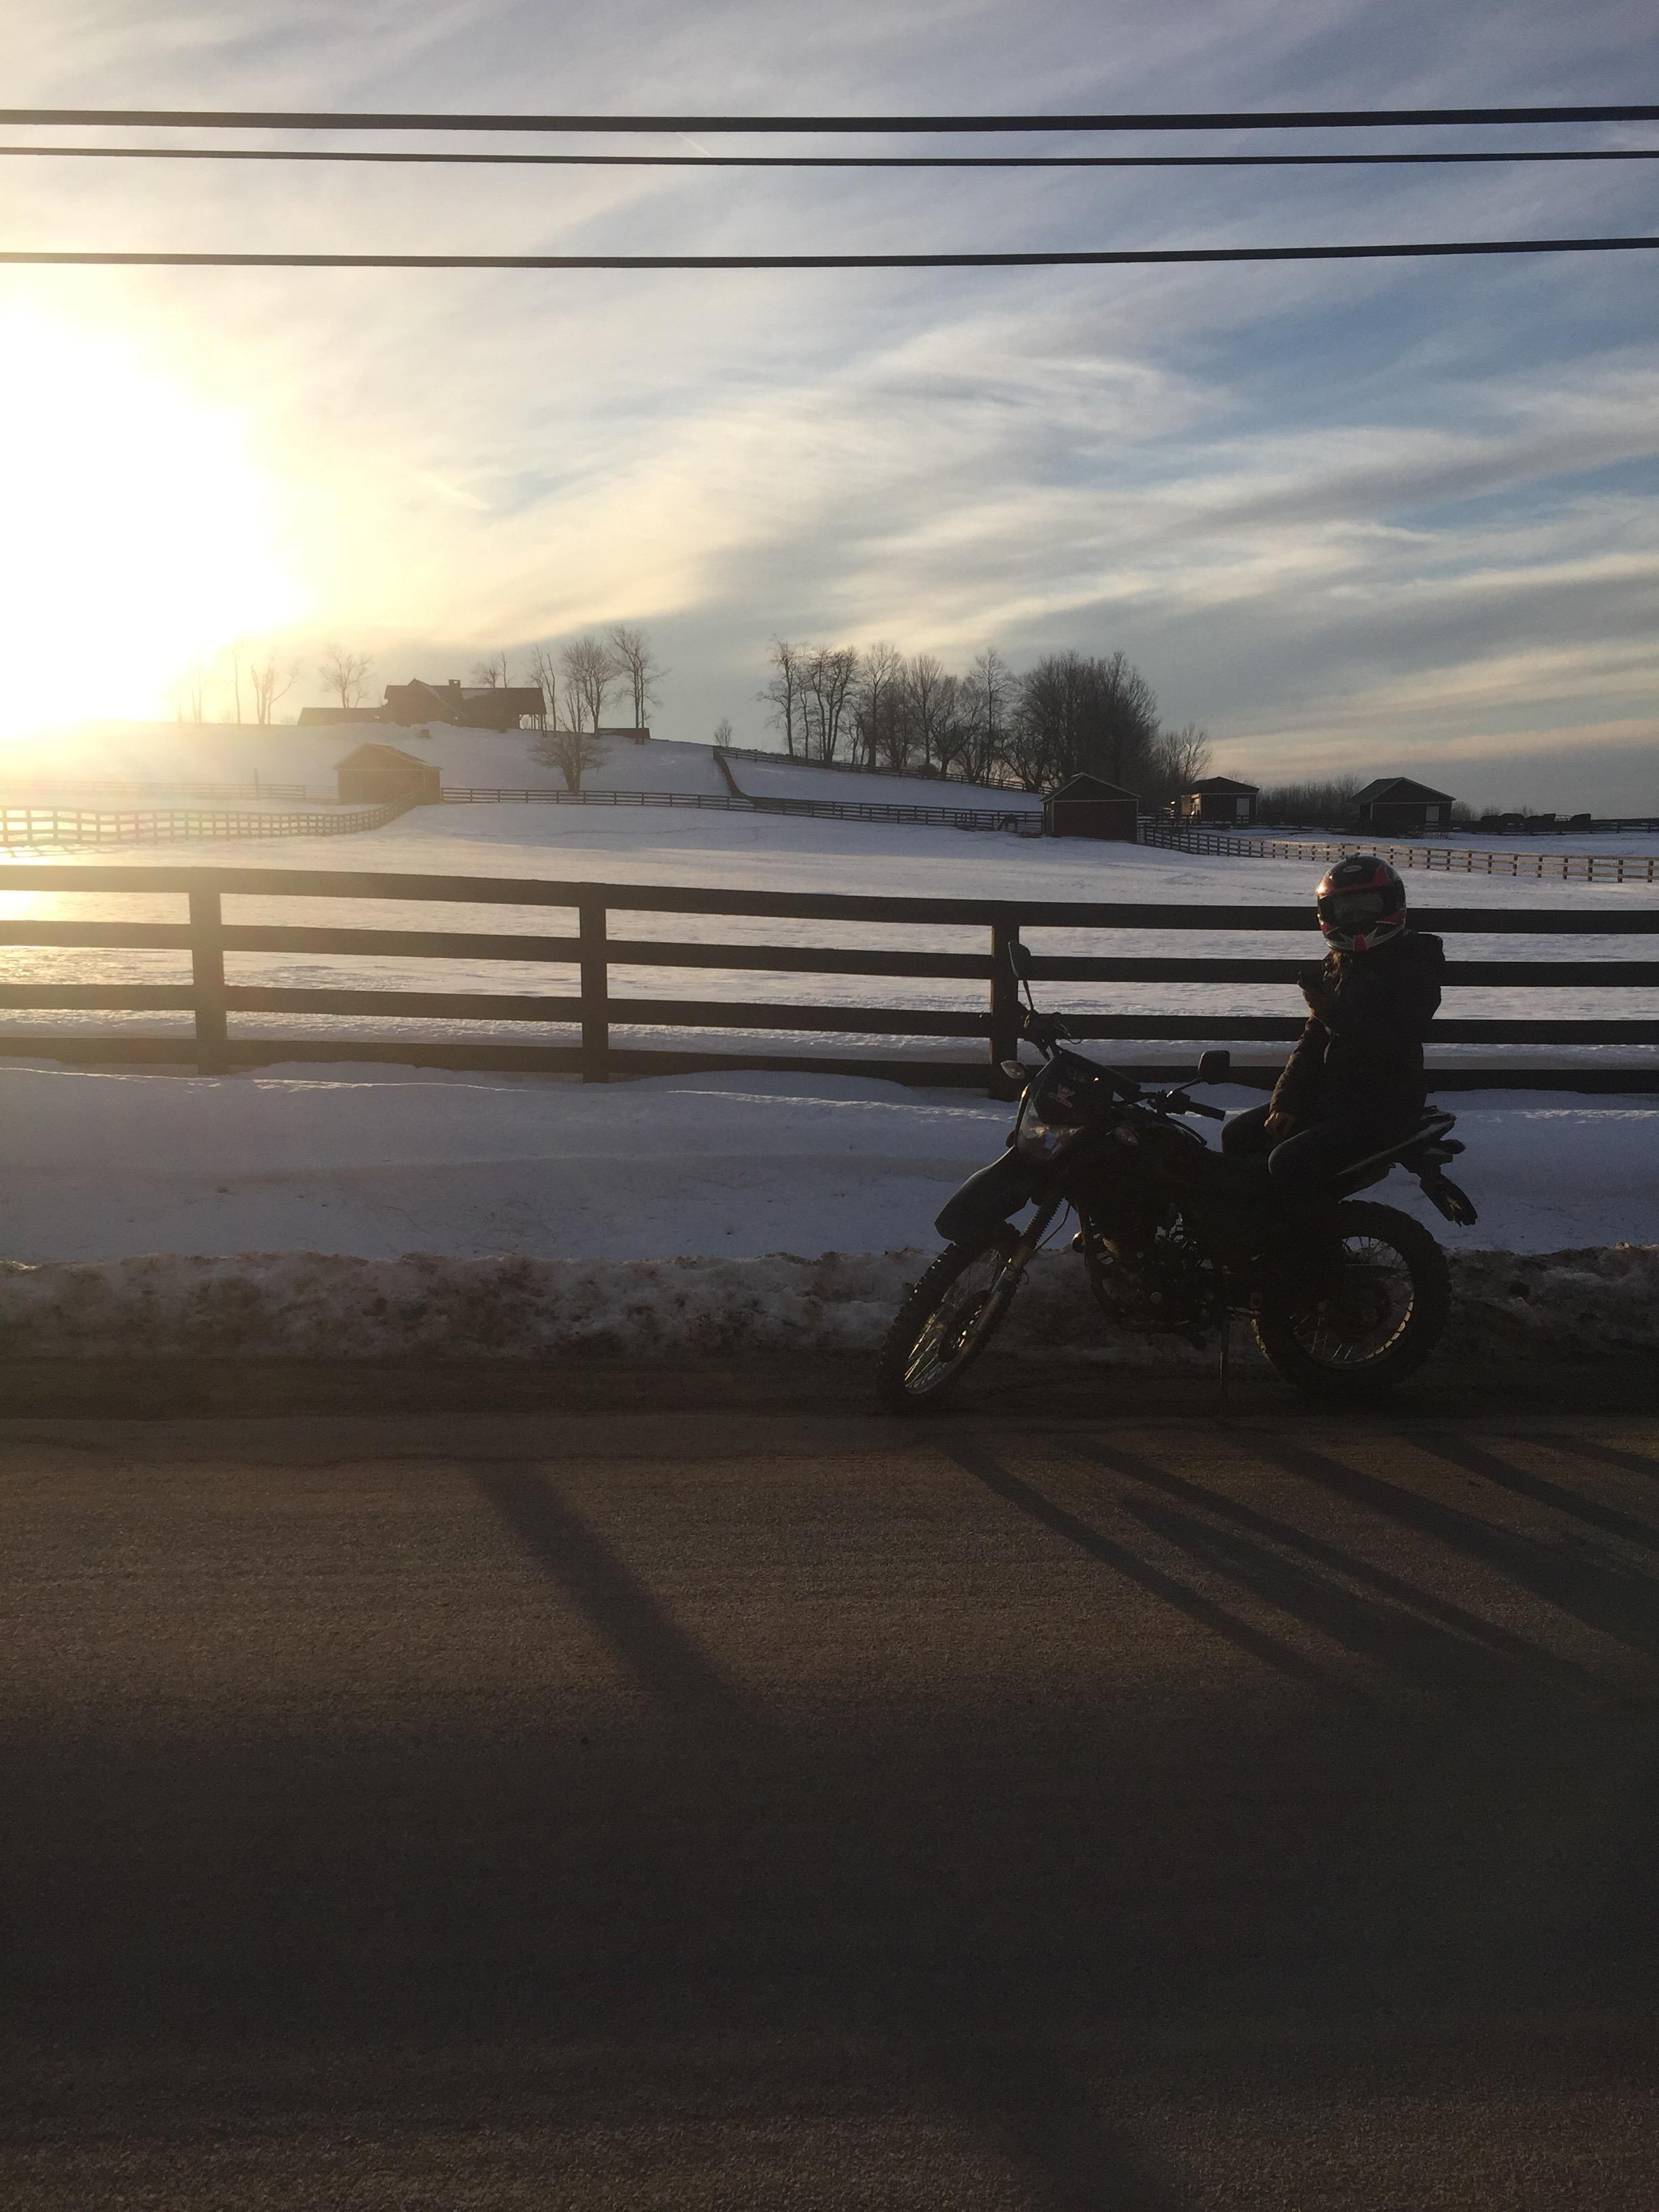 Hawk 250 Time Lapse Video Feb 18th Ride